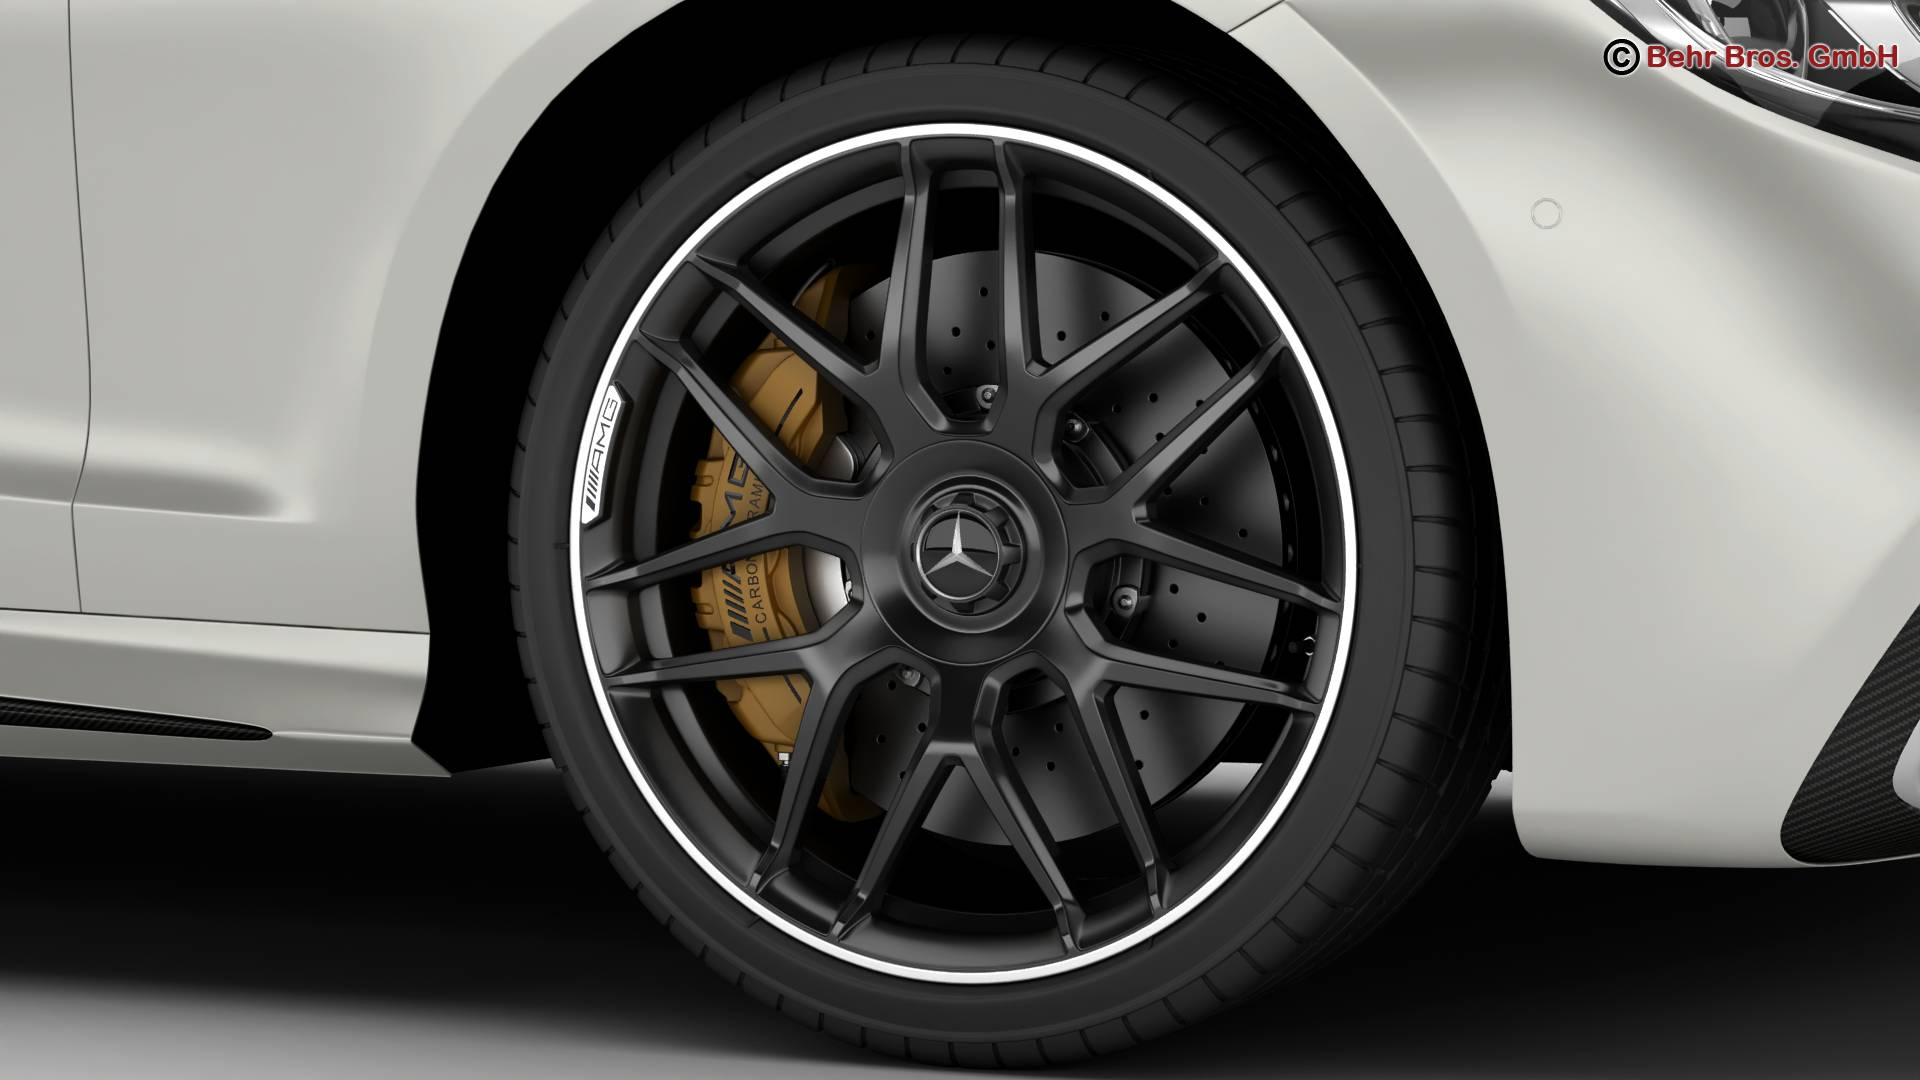 mercedes s class coupe amg s63 2018 3d model 3ds max fbx c4d lwo ma mb obj 274100